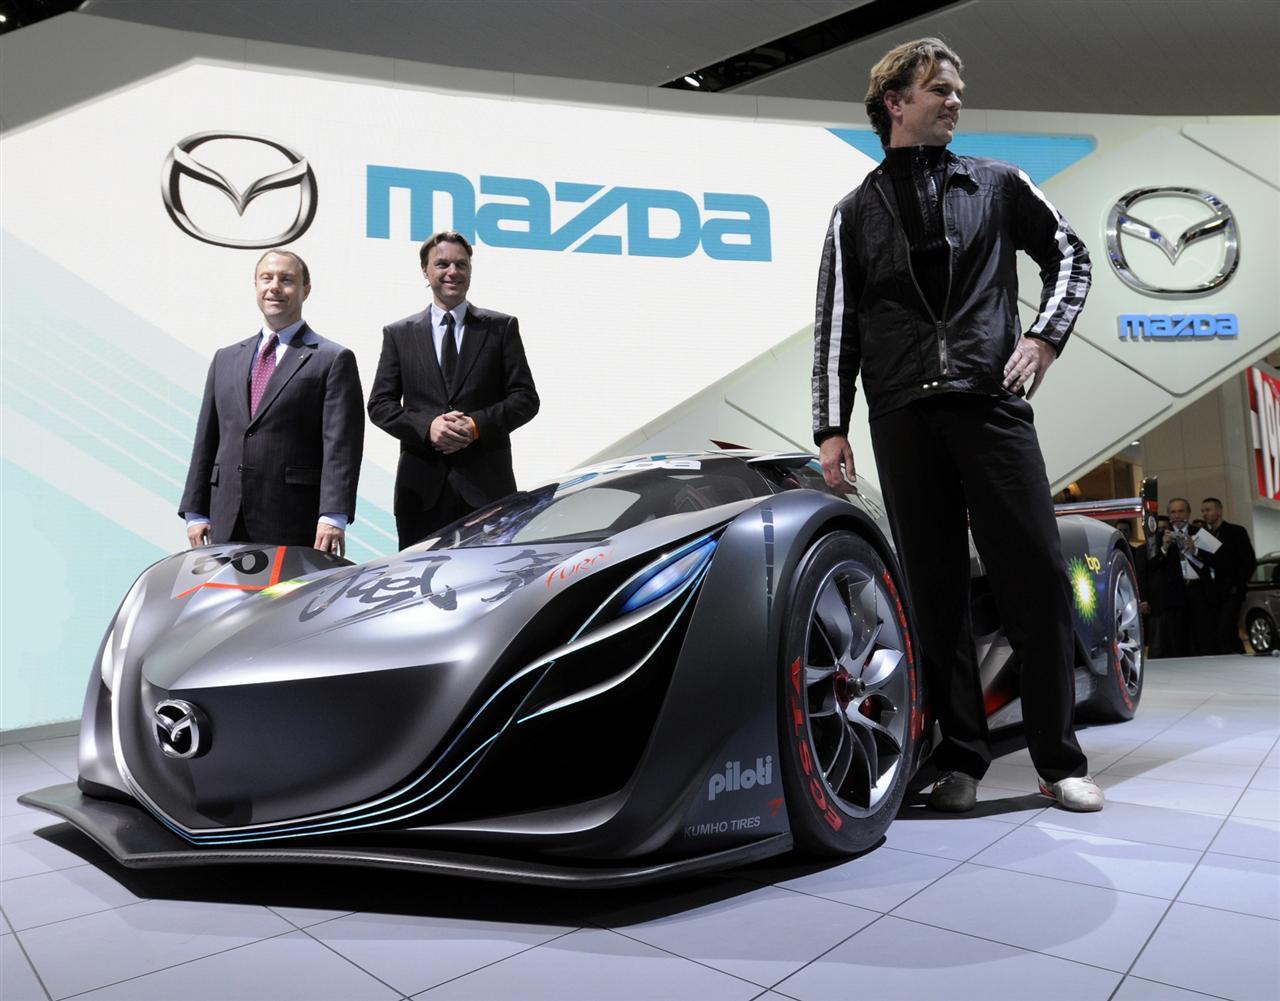 https://www.conceptcarz.com/images/Mazda/mazda-Furai_2008_NAIAS_04-1280.jpg